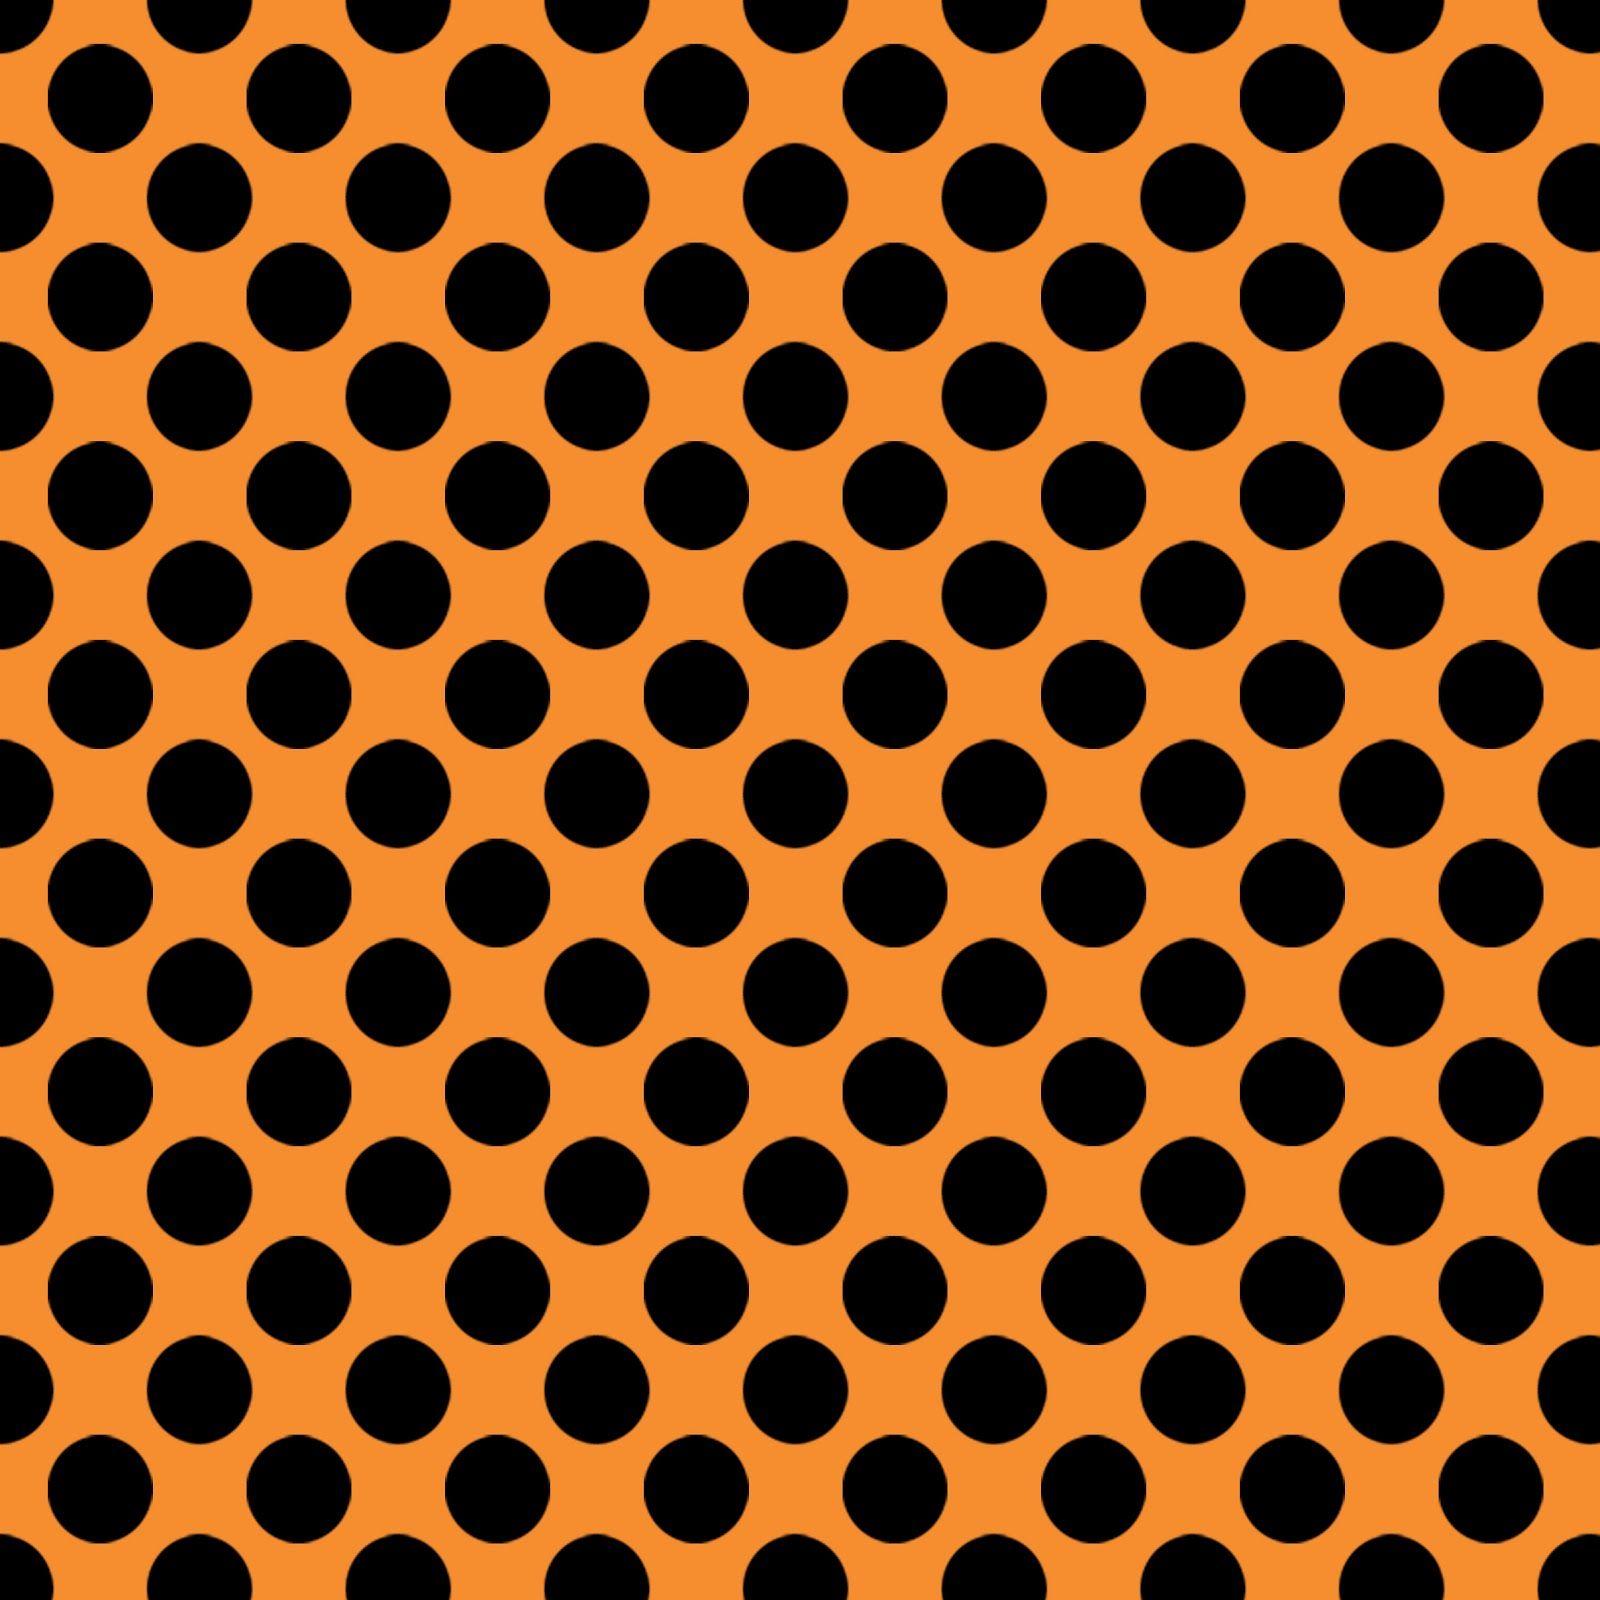 Most Inspiring Wallpaper Halloween Polka Dot - 650b466acf54c666992ac1d91aeee539  Graphic_427026.jpg